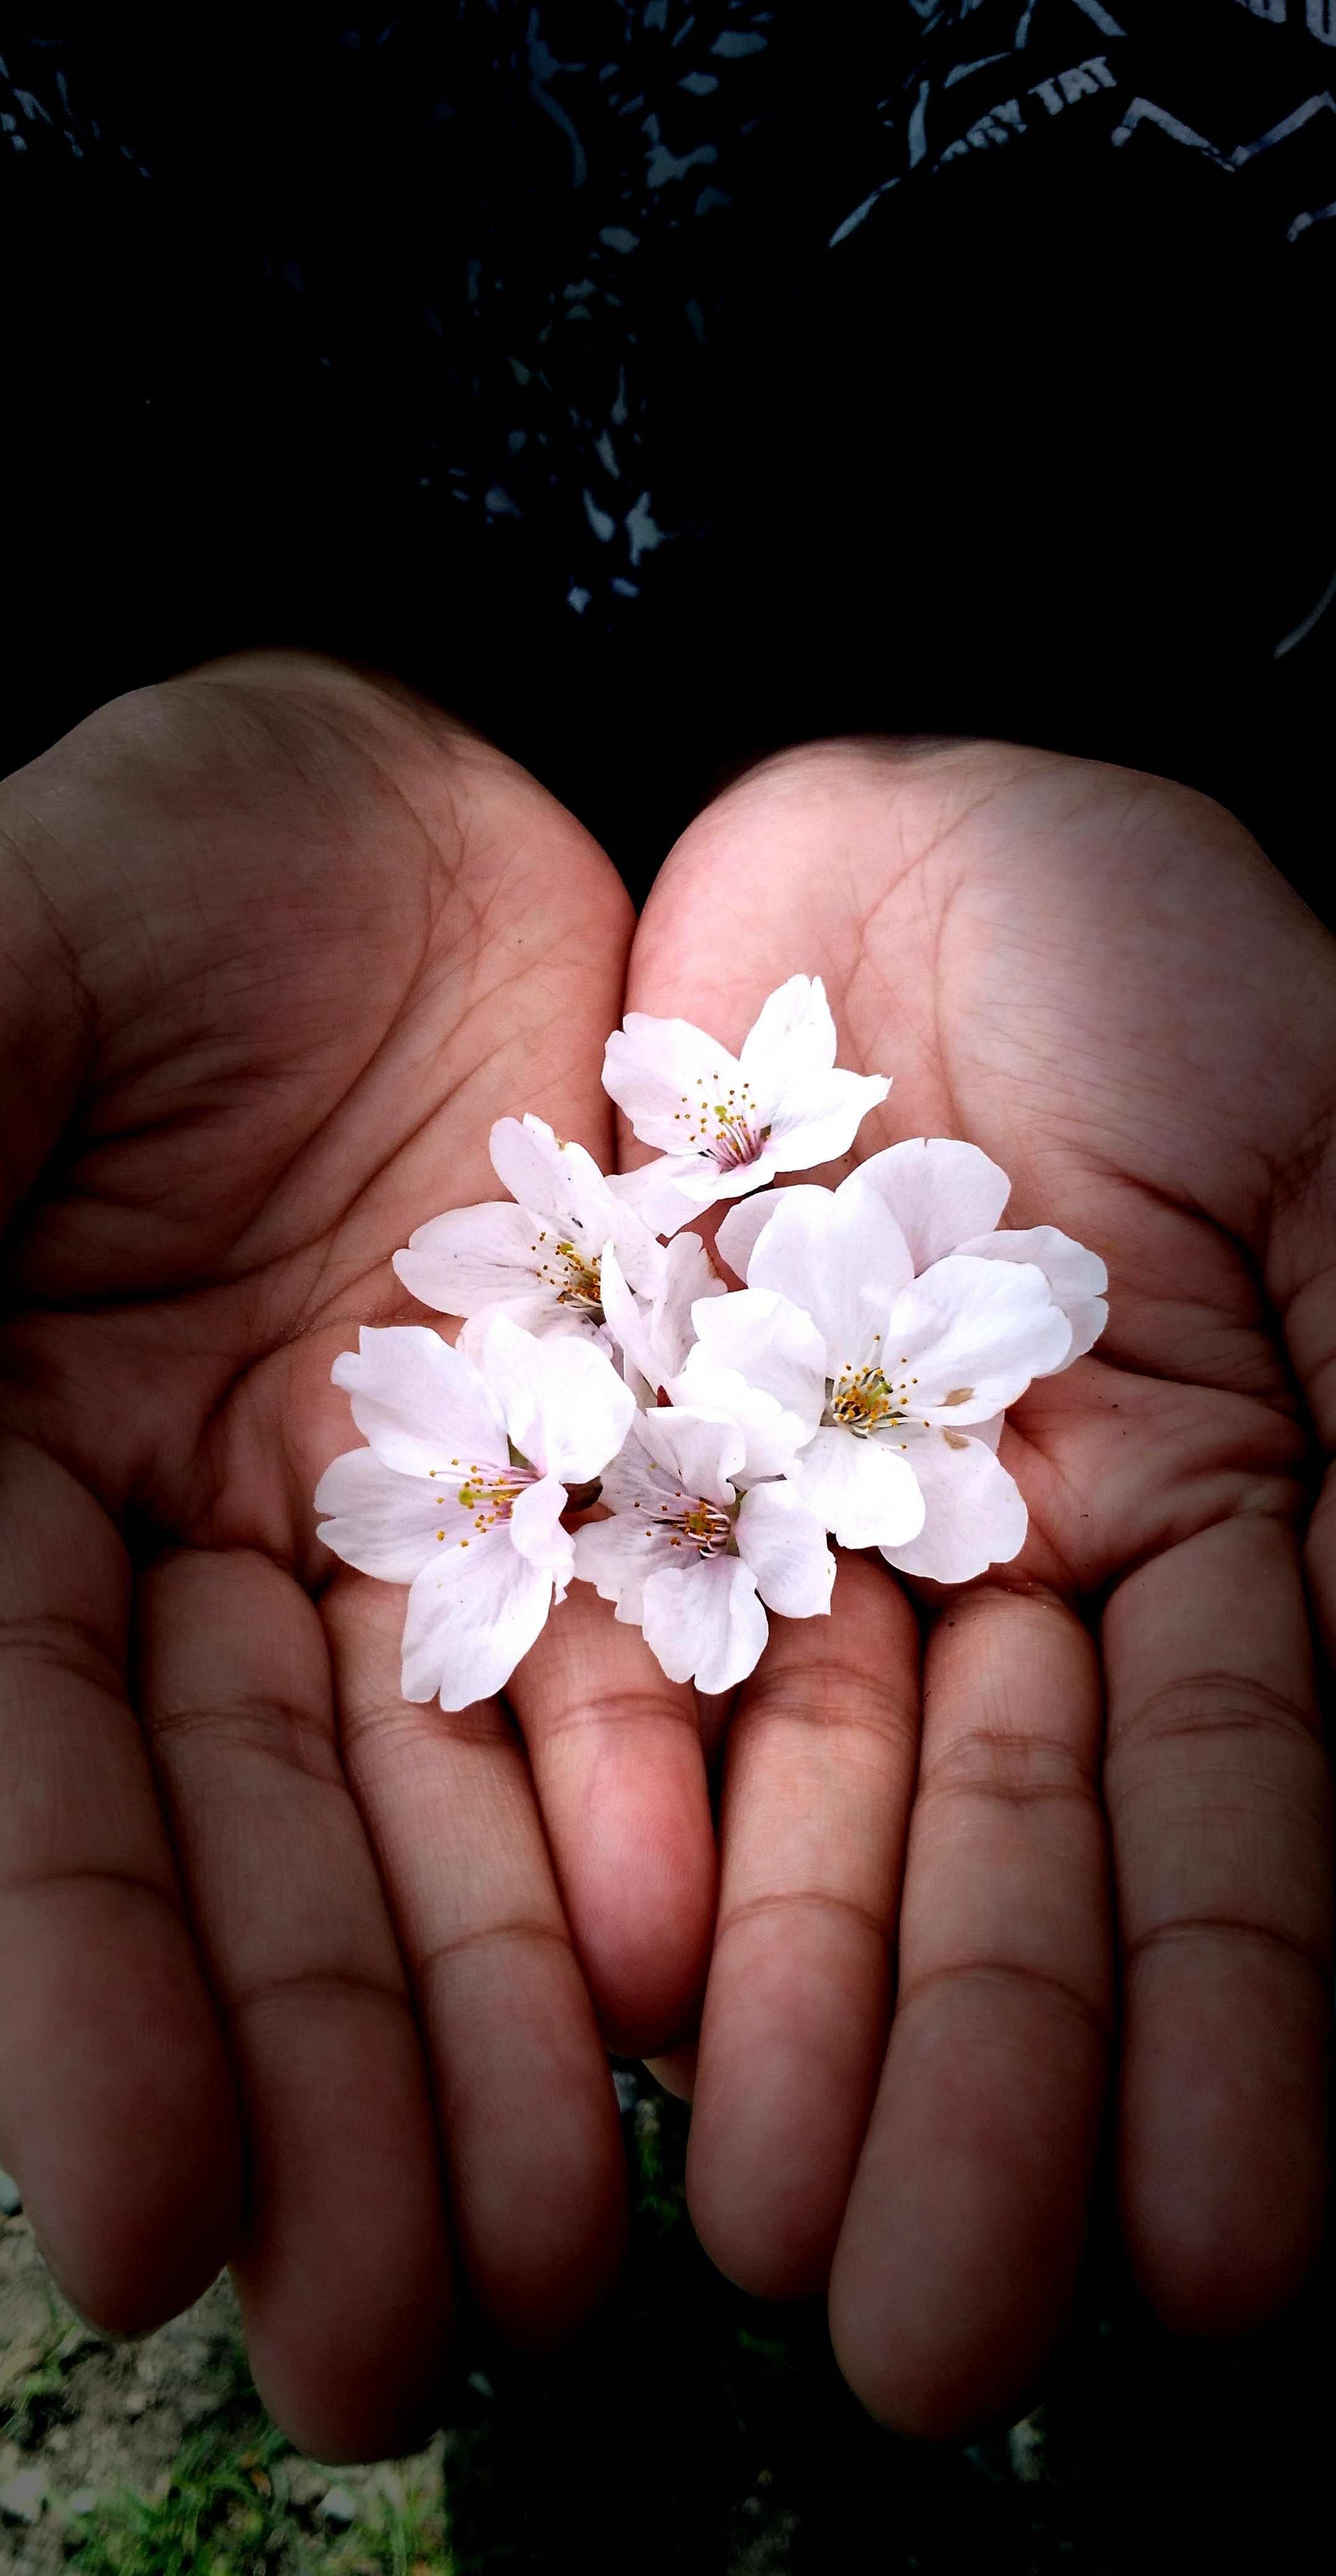 Touch my Little Blossom – Richard Dims Villagonzalo Clarin